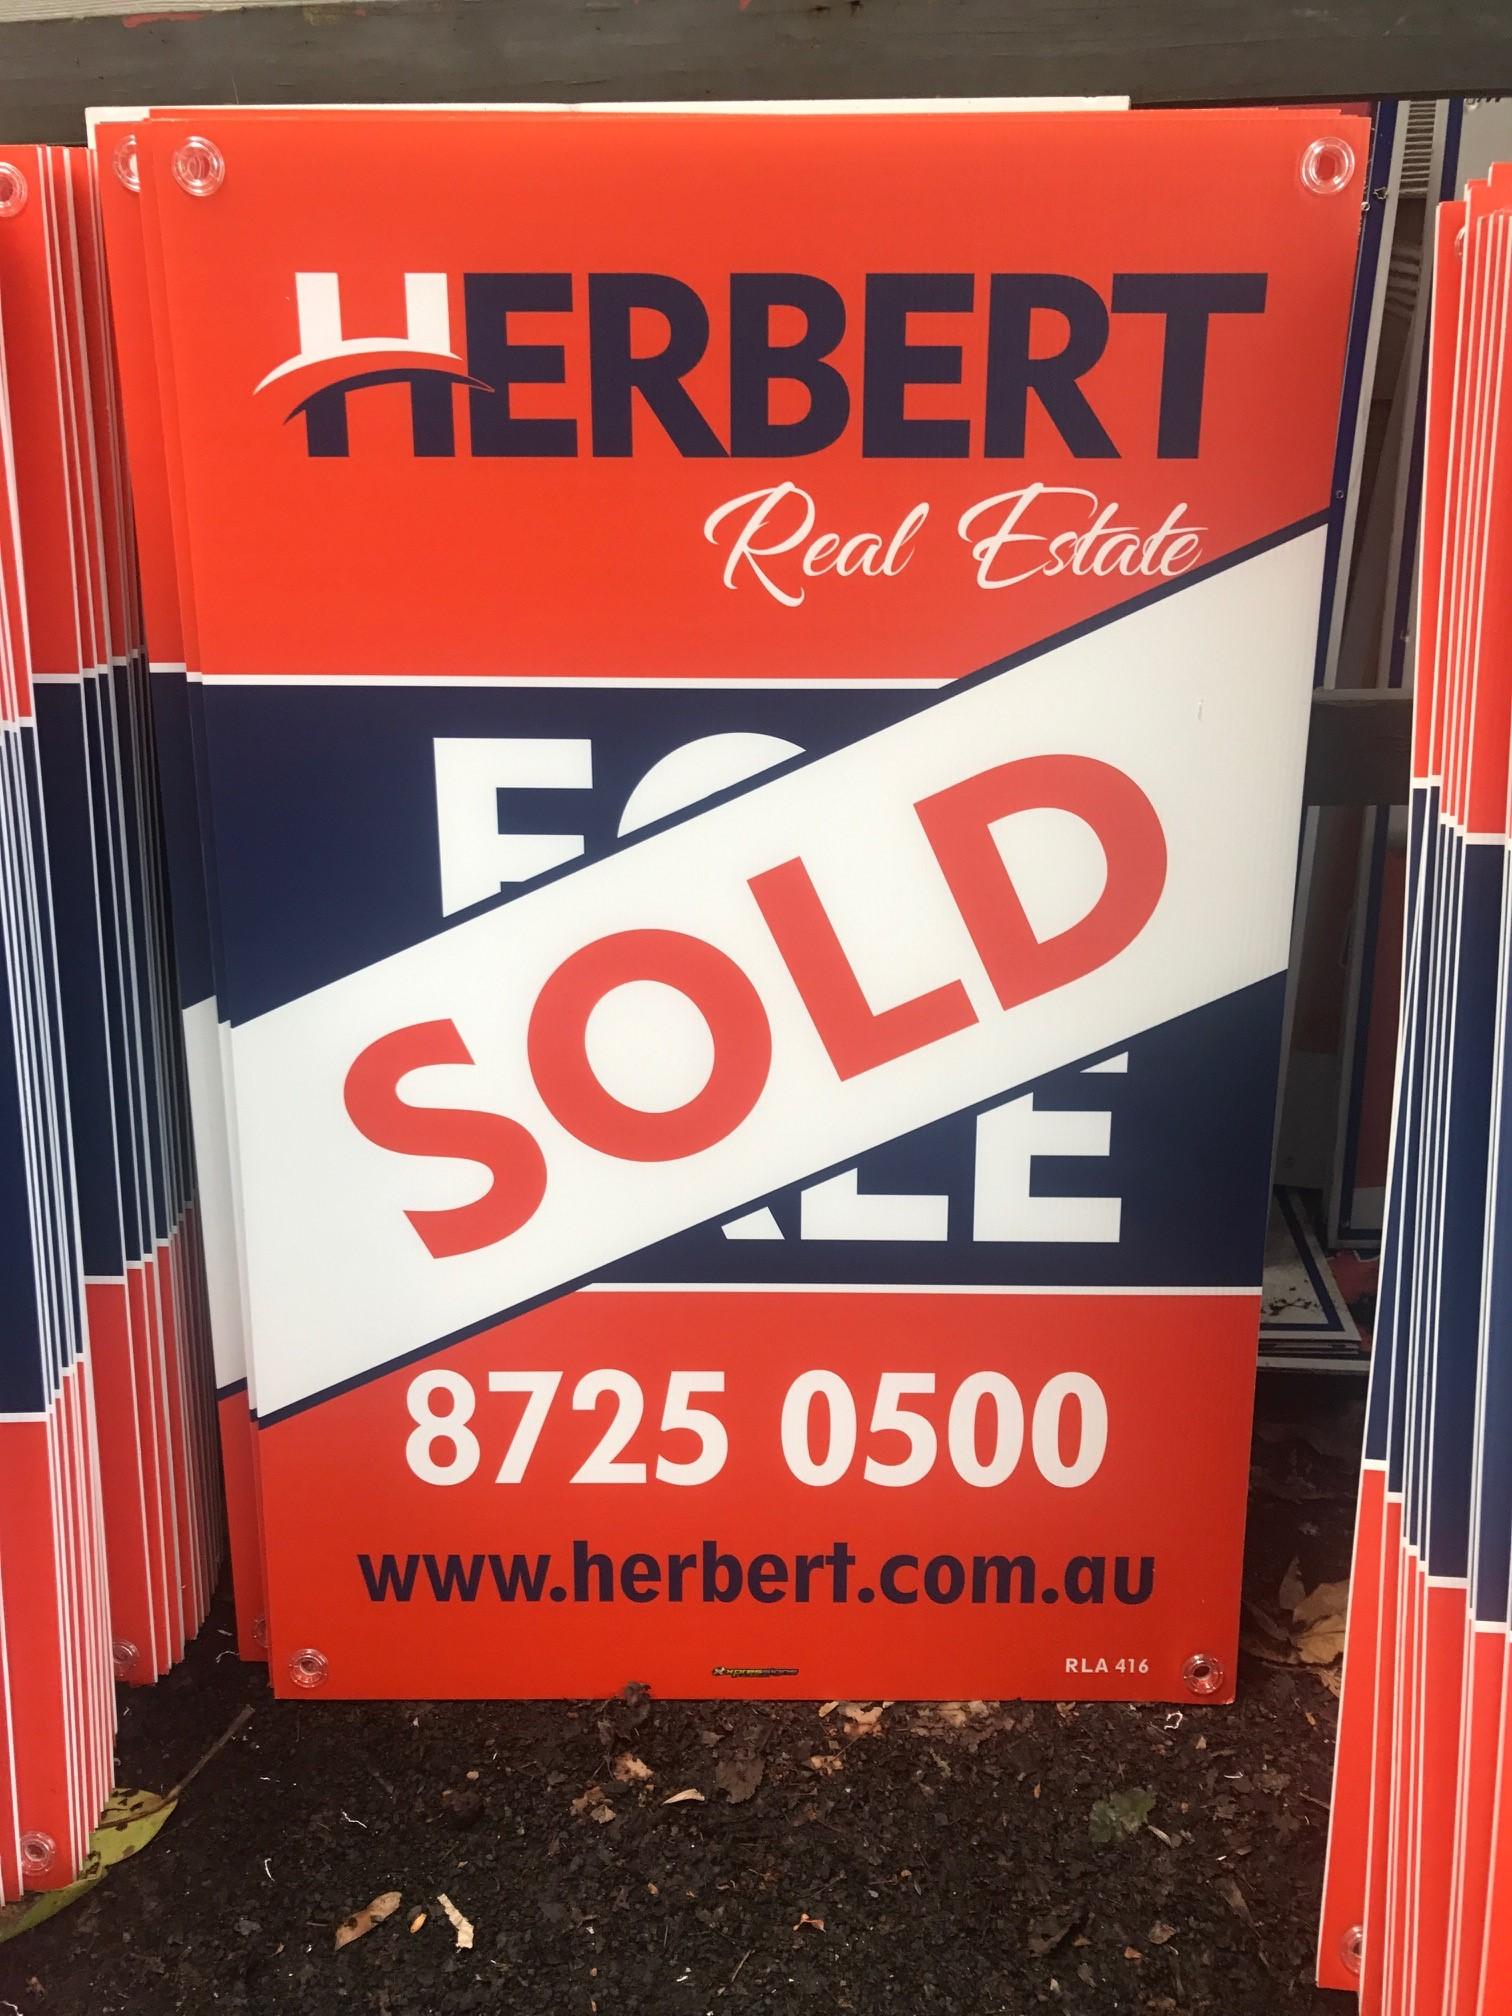 Herbert Real Estate For Sale Corflutes